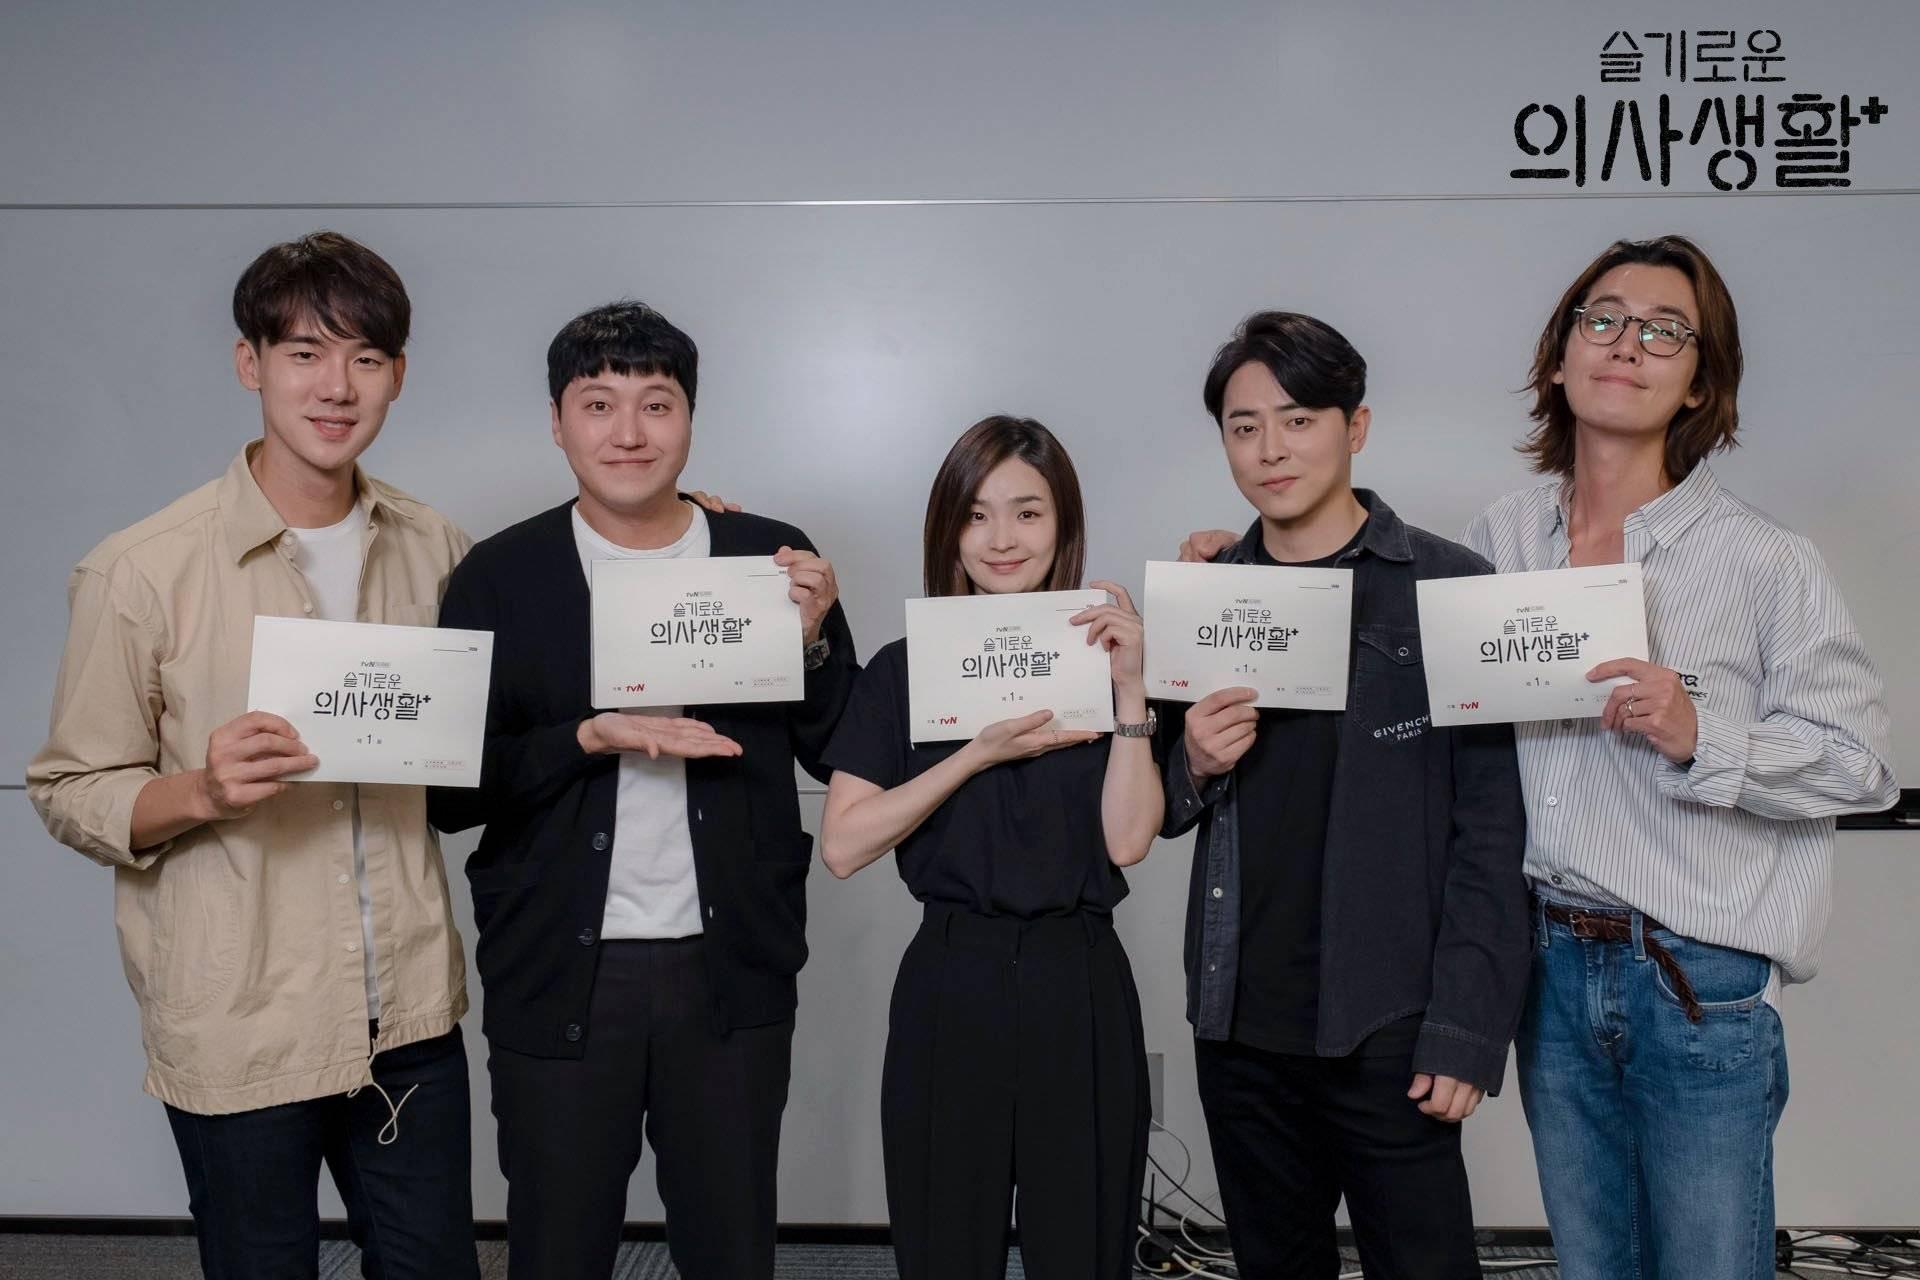 Hospital Playlist Korean Drama 2020 슬기로운 의사생활